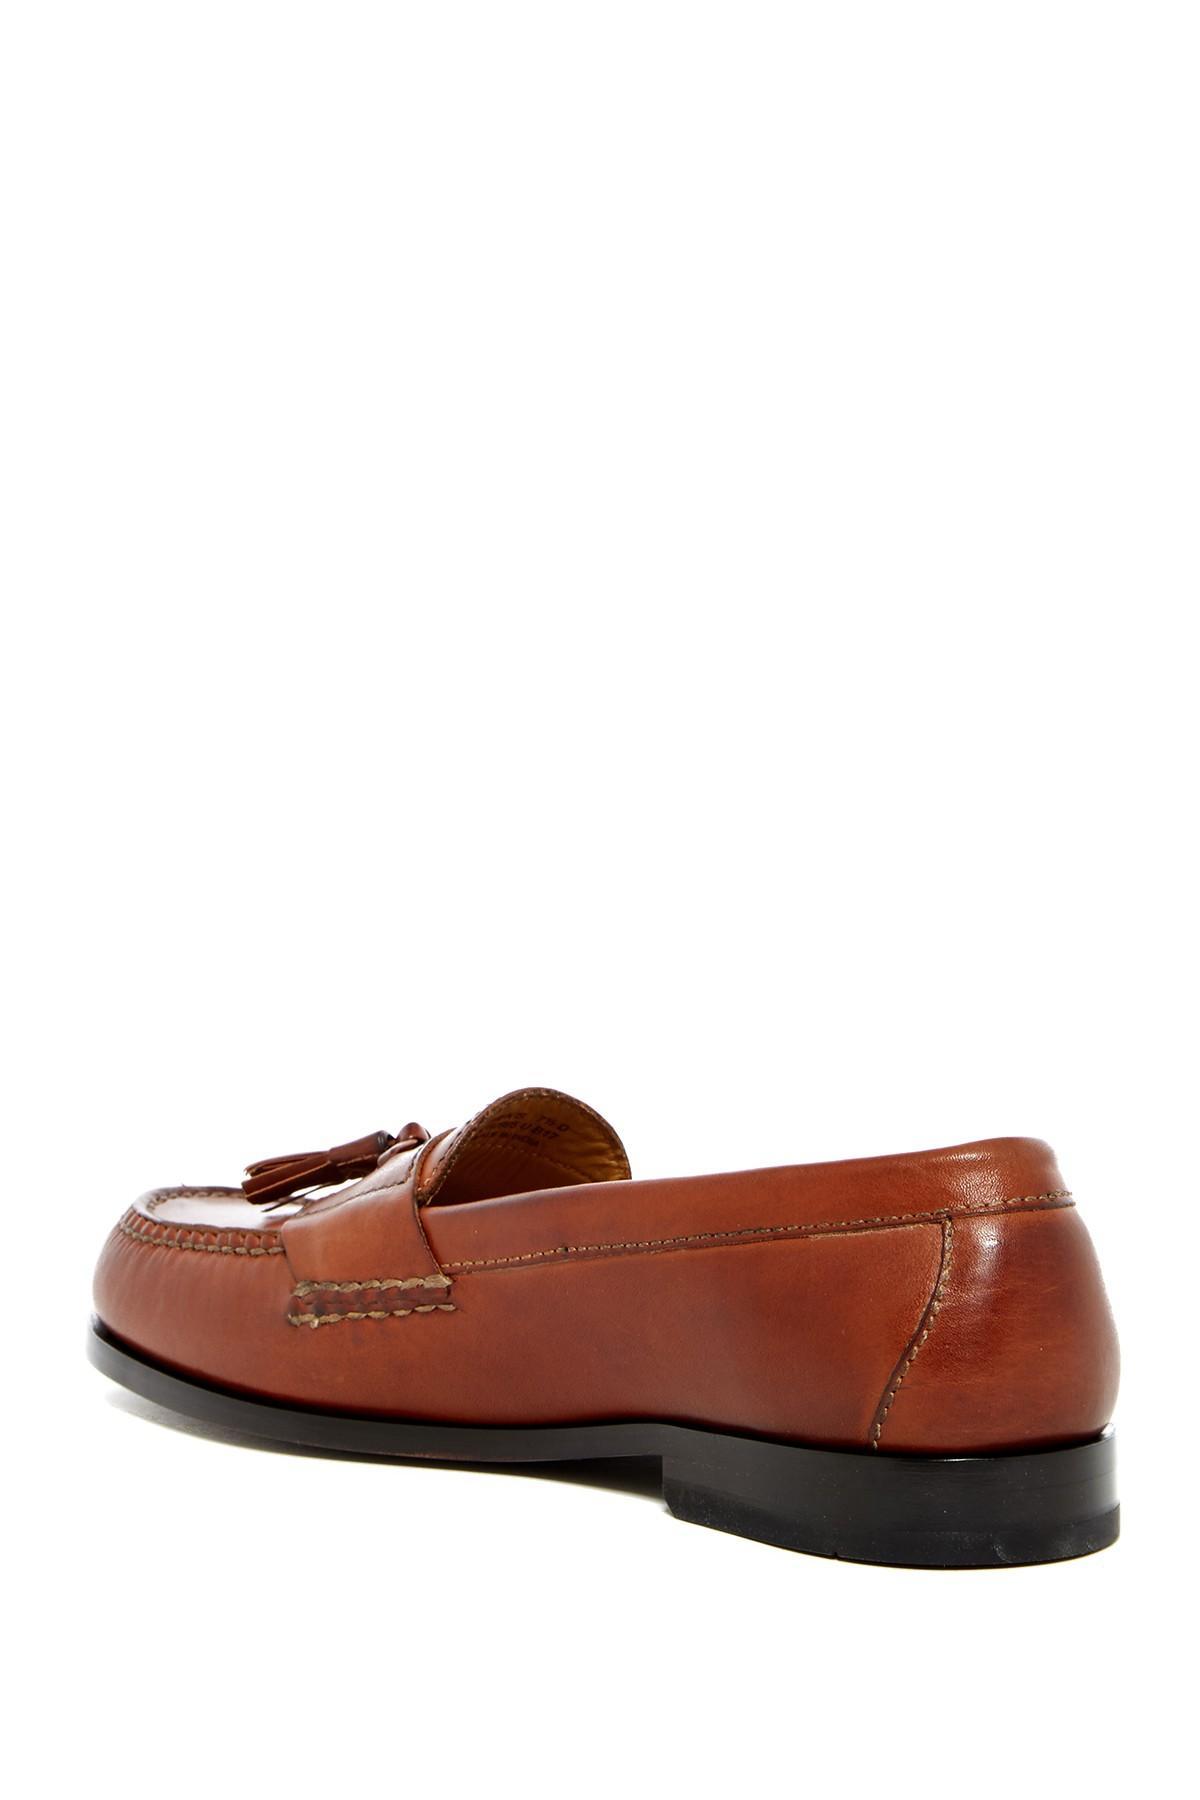 Ralph Lauren Brown Genuine Leather Women Shoes